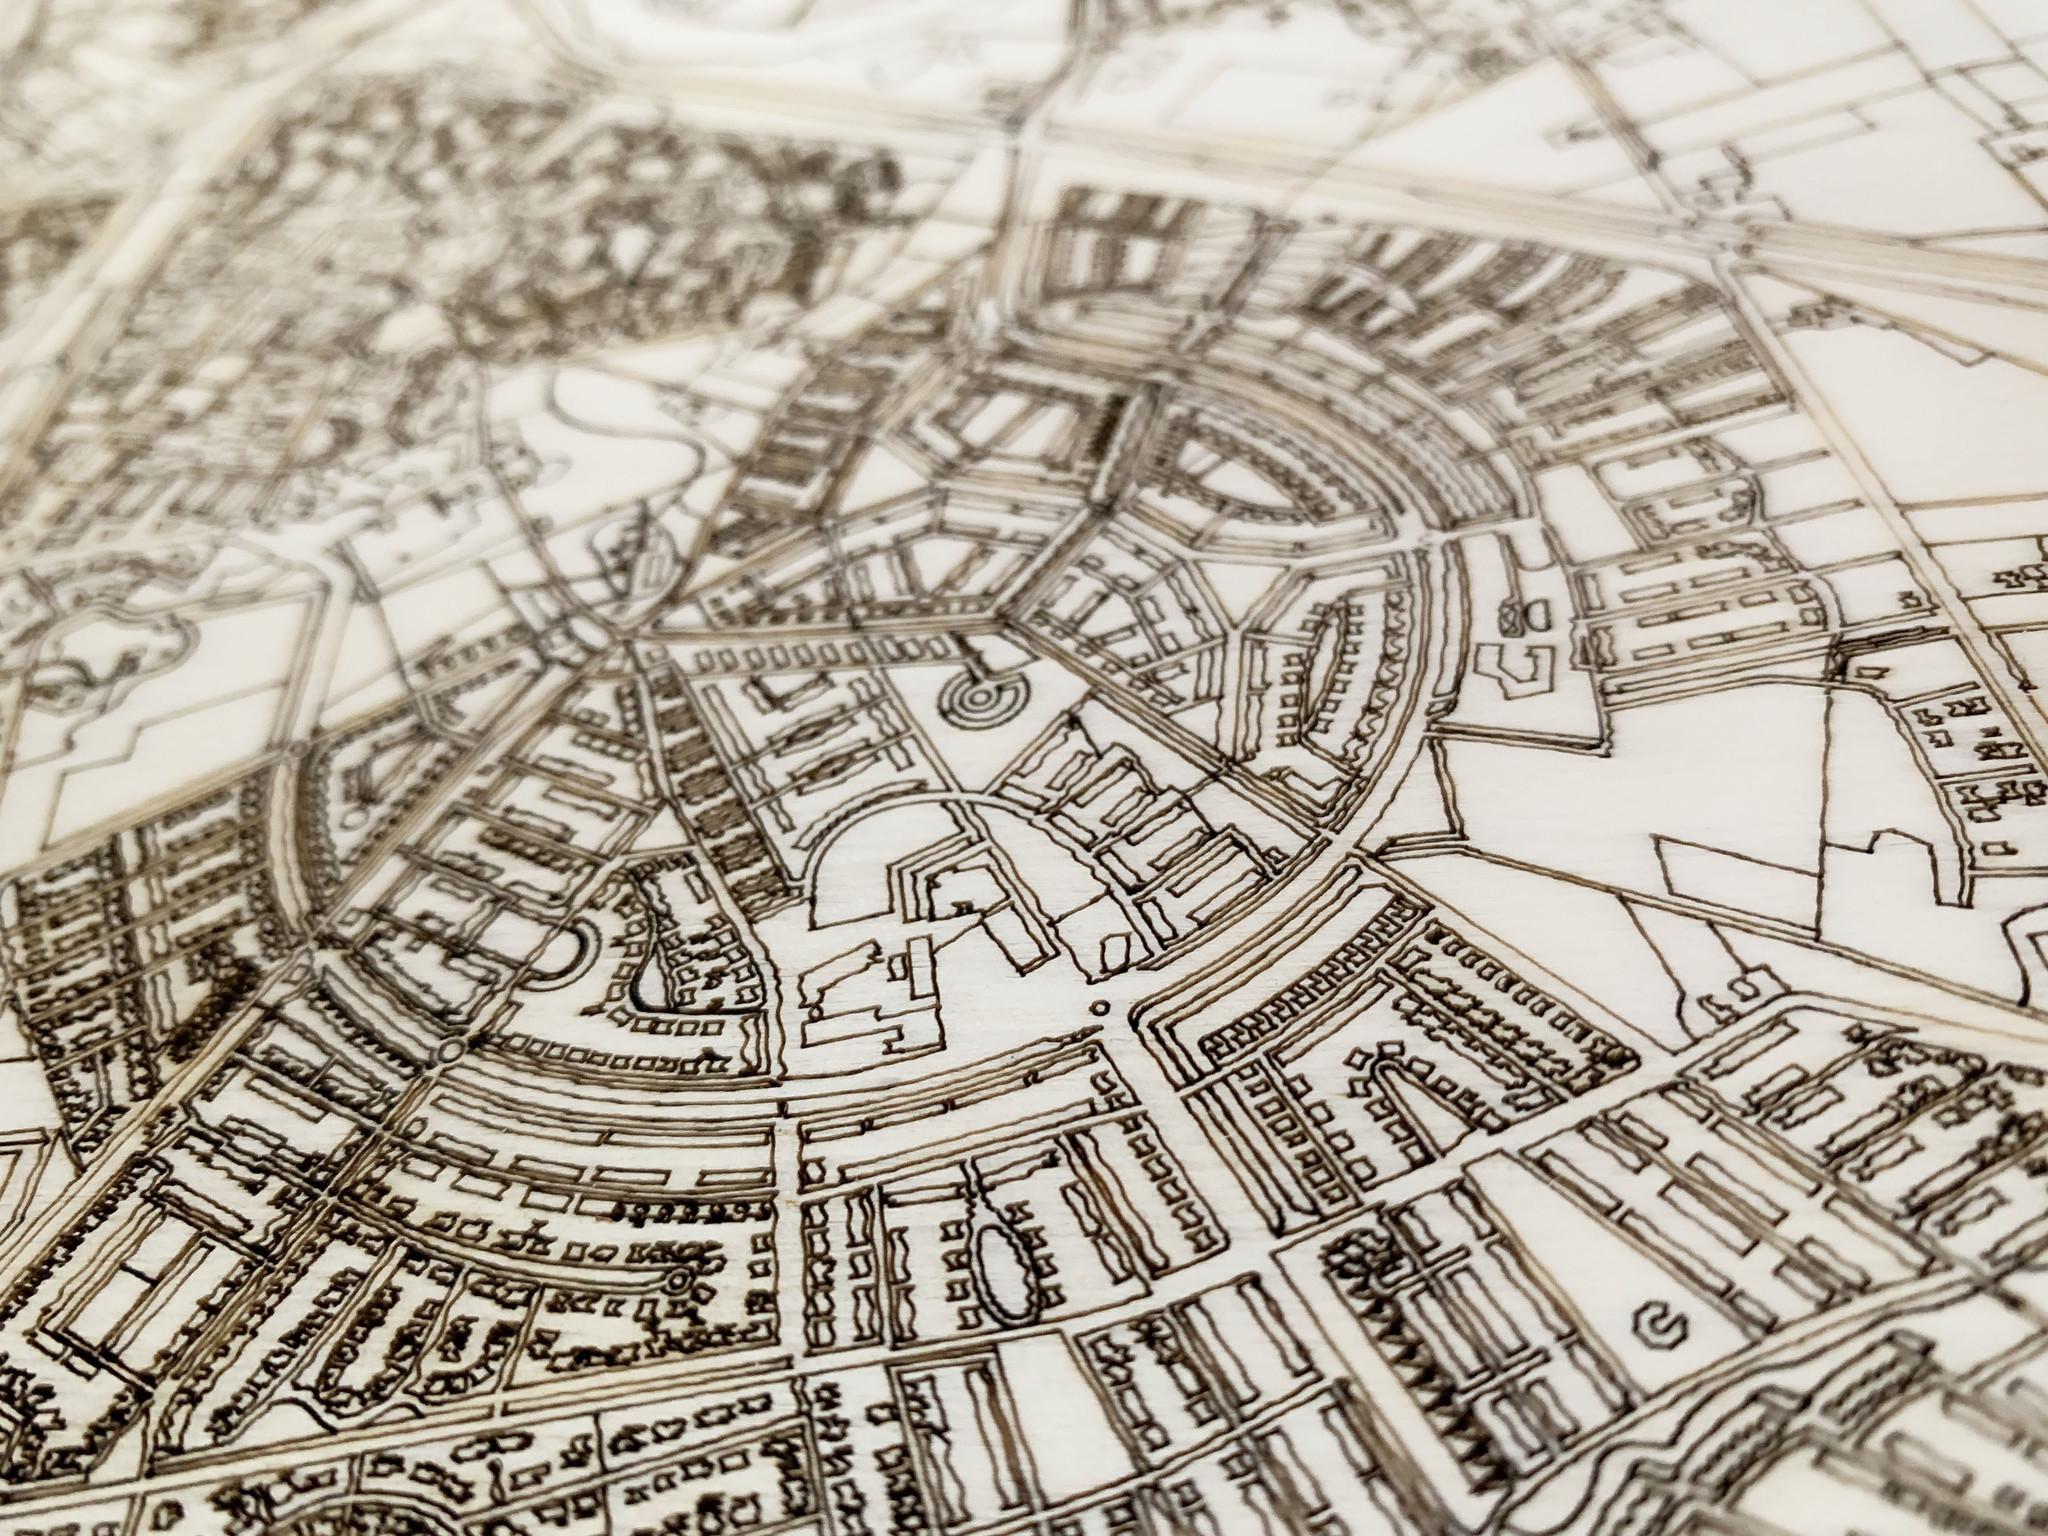 Houten stadsplattegrond Londen-4